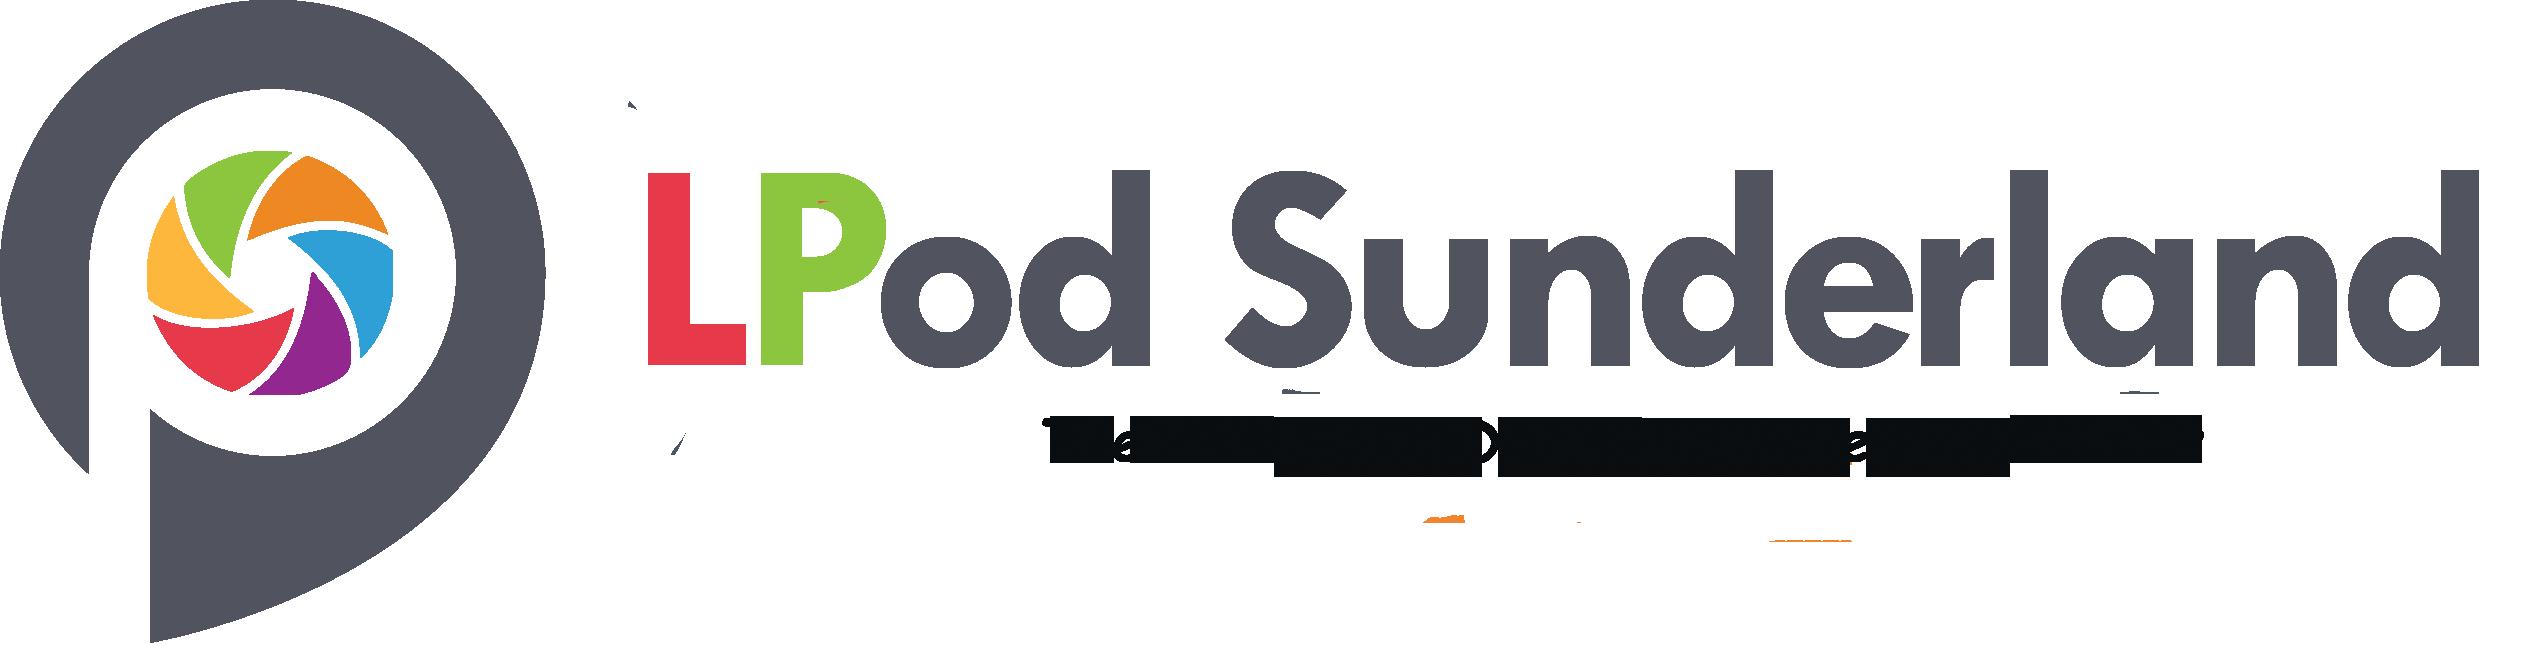 intensive driving courses sunderland, intensive driving lessons sunderland, intensive driving school sunderland